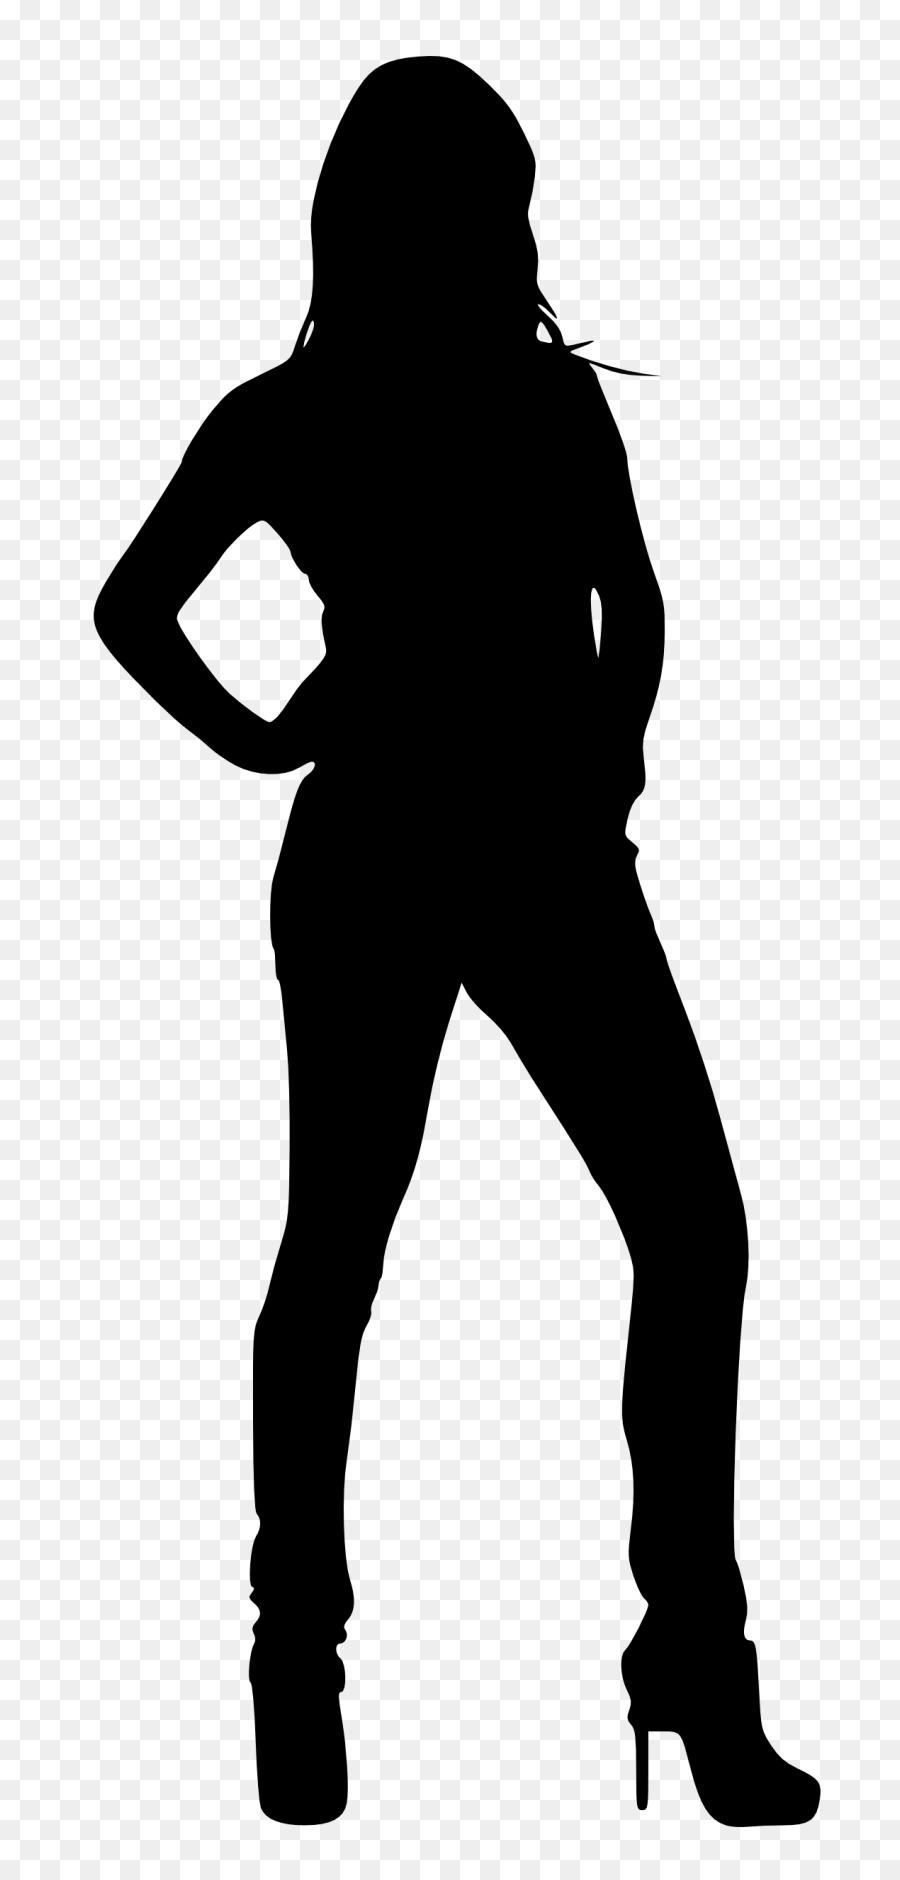 900x1880 Silhouette Woman Clip Art